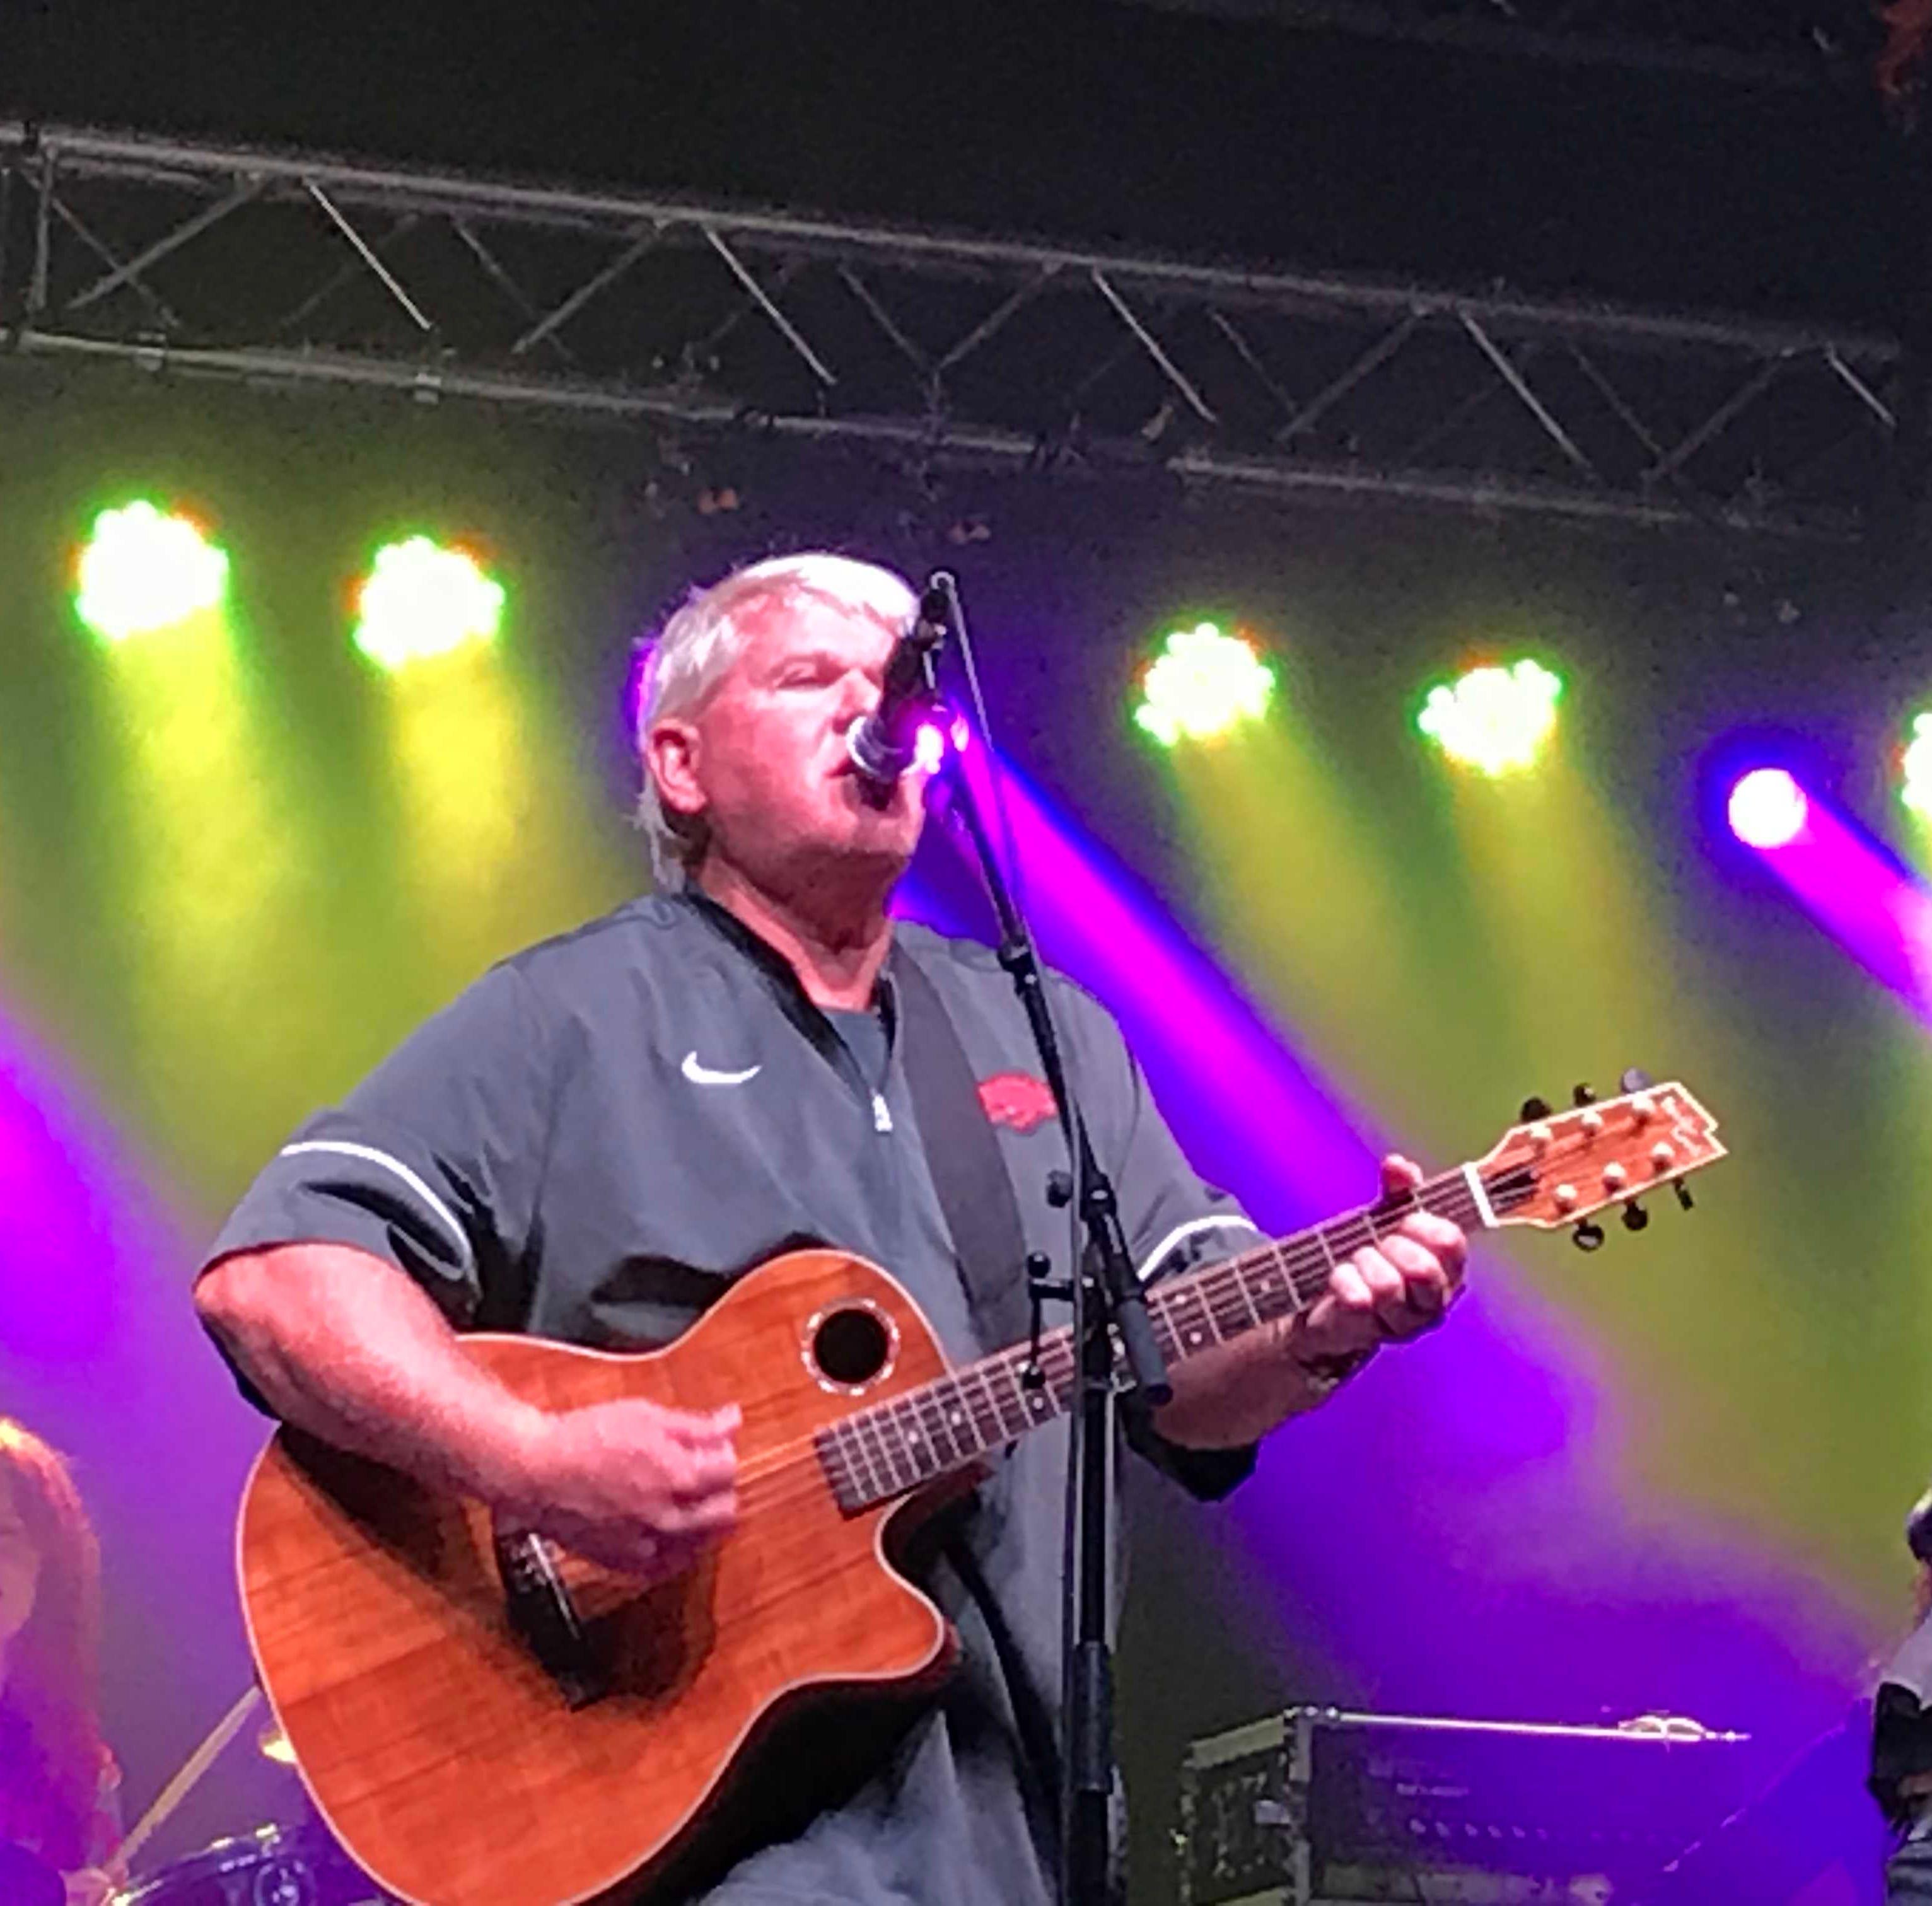 John Daly aces 'Knockin' on Heaven's Door' at Sanford International event